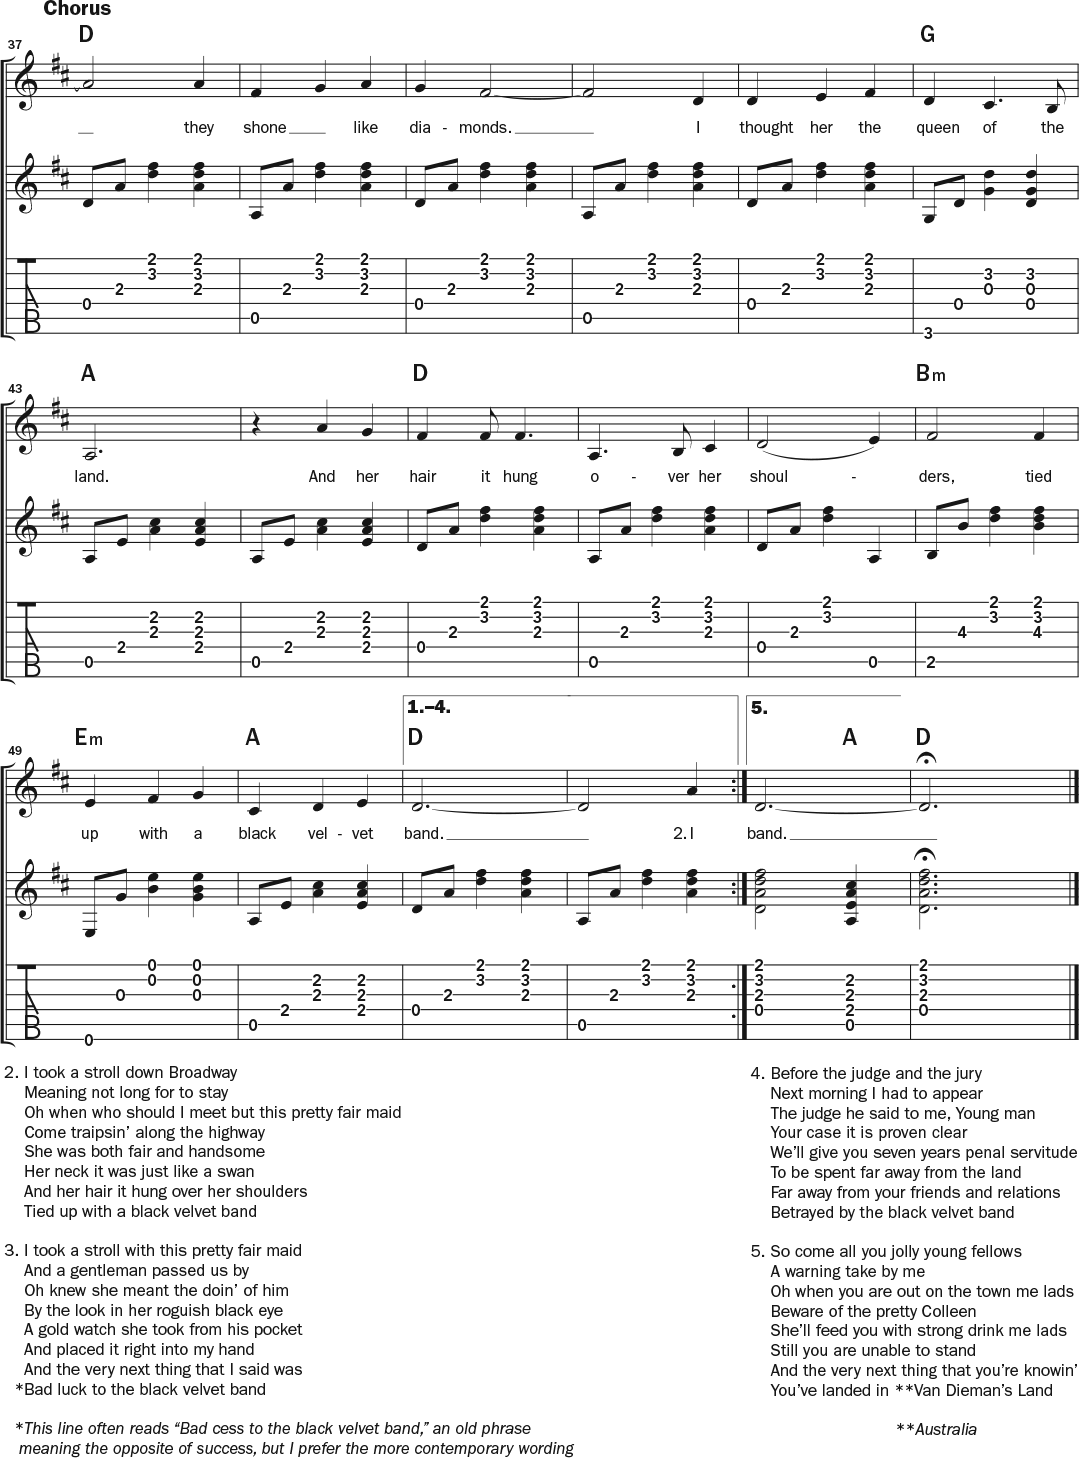 Black Velvet Band Learn To Play This Popular Irish Waltz